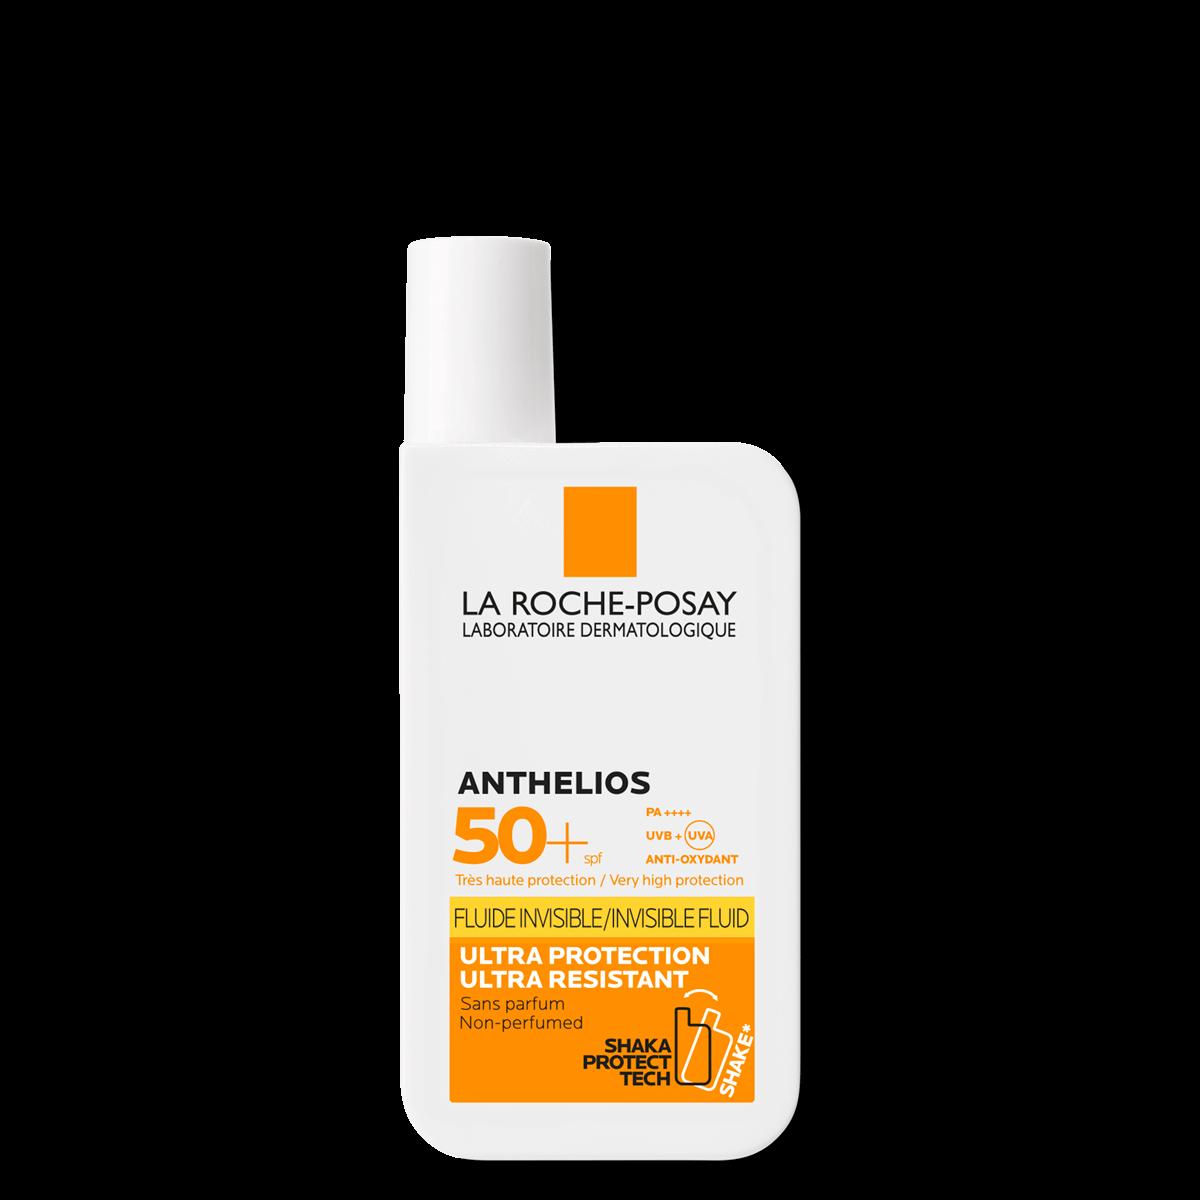 LaRochePosay-Tuote-Aurinko-Anthelios-InvisibleFluidSpf50-50ml--without-perfume-30162662-FWS